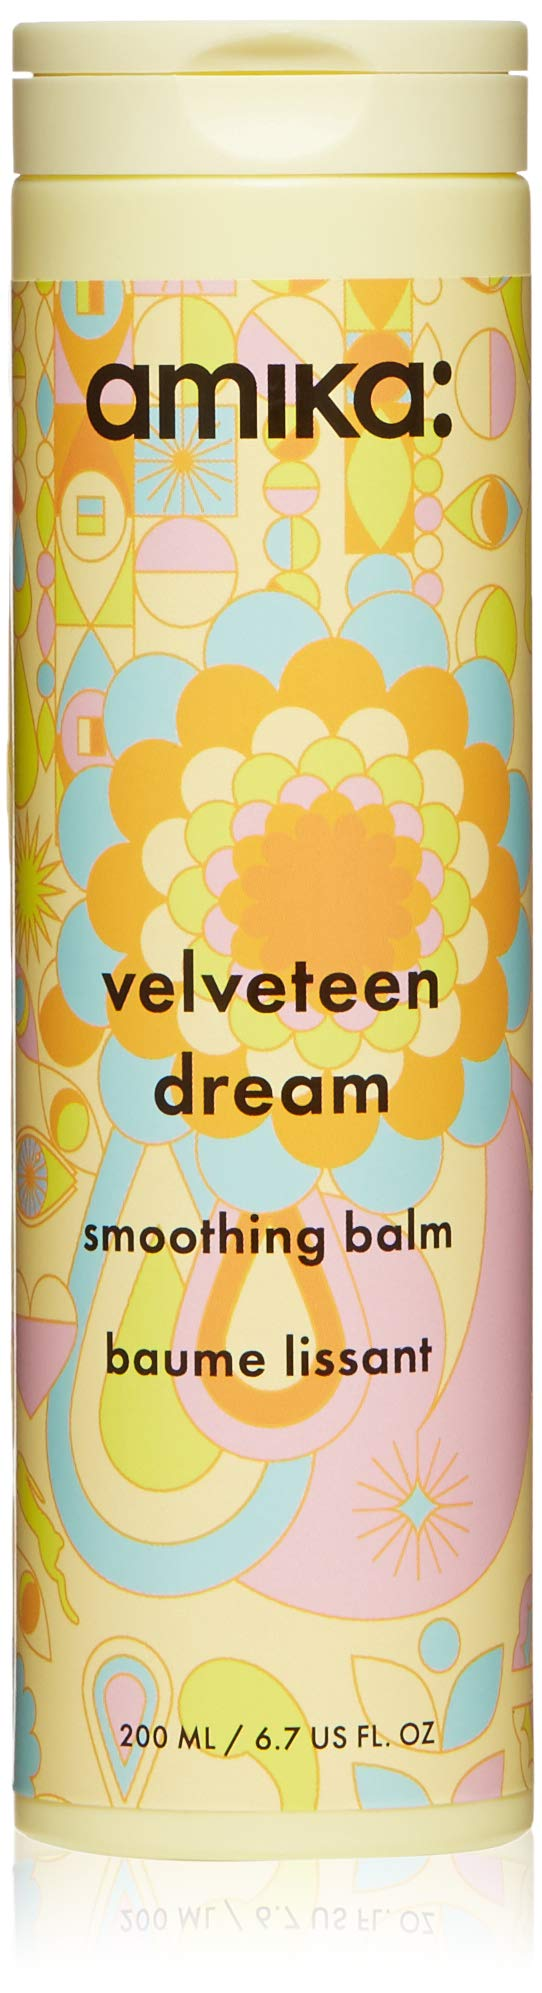 amika Velveteen Dream Smoothing Balm, 6.7 oz